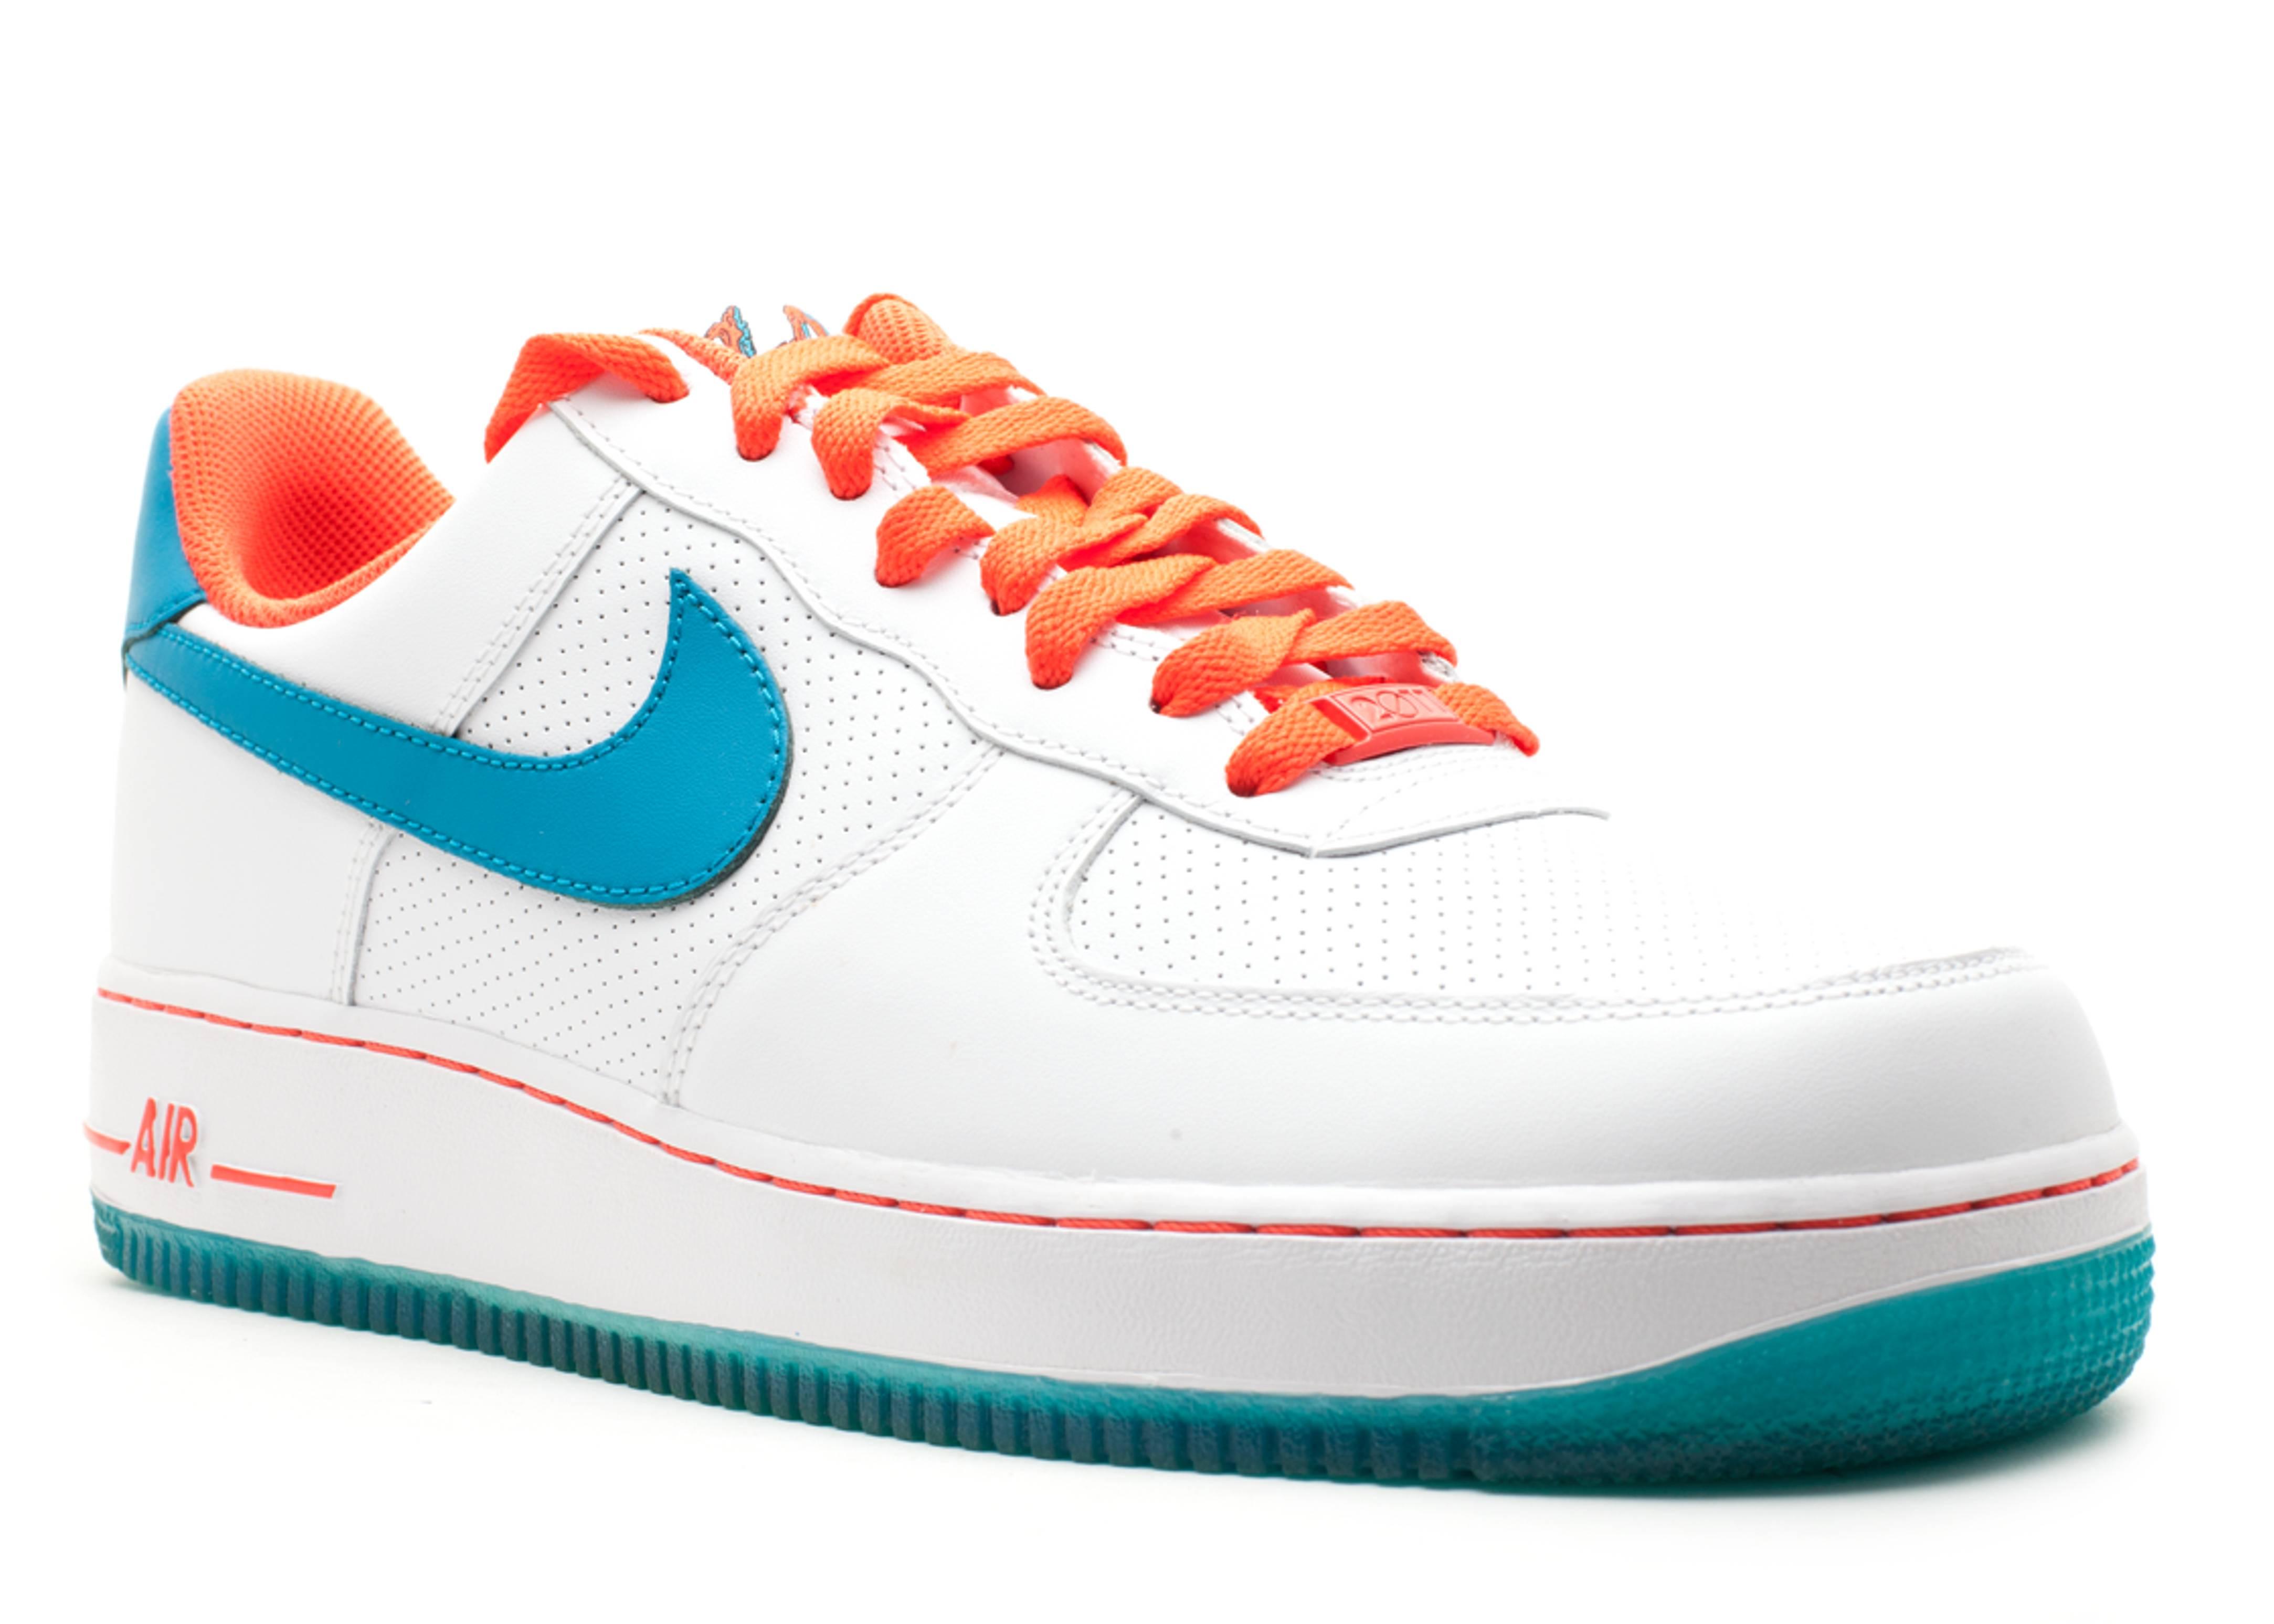 nike air huarache ultra, Nike Air Force 1 2011 All Star